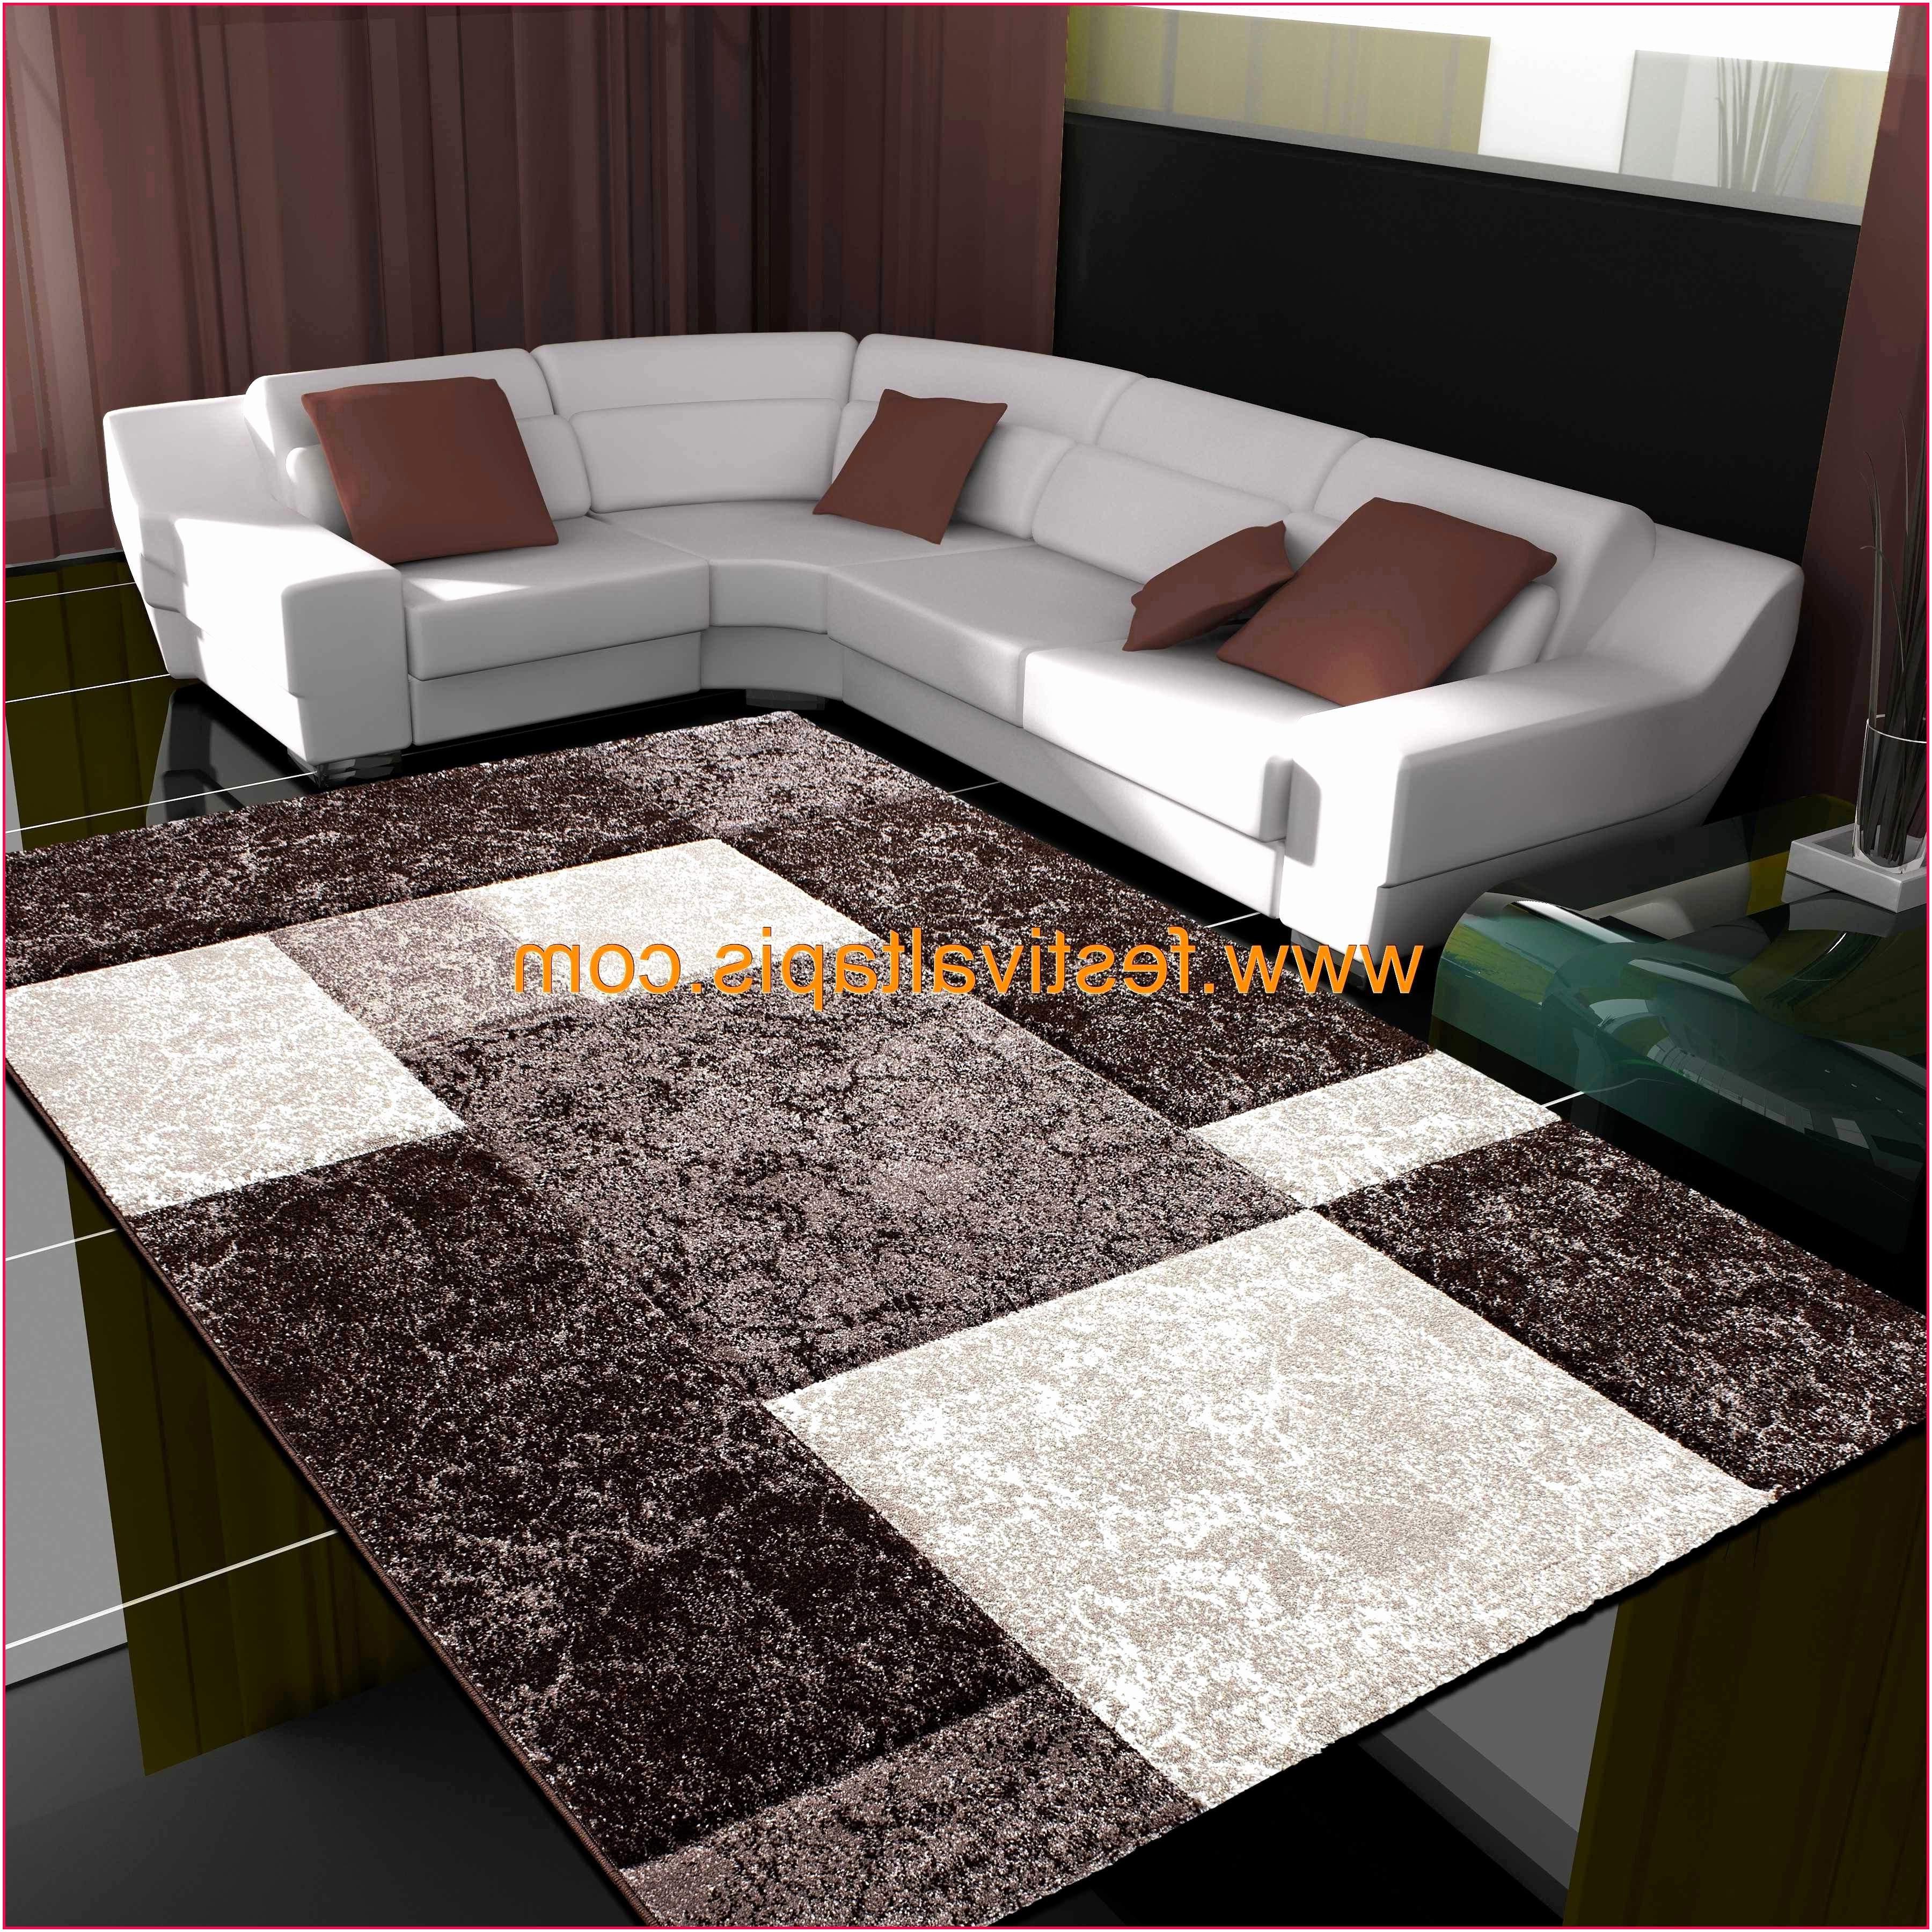 Lavabo Salle De Bain Ikea Luxe Stock Tapis Evier Ikea élégant Salle Bain Ikea Nouveau Admiré Tapis De